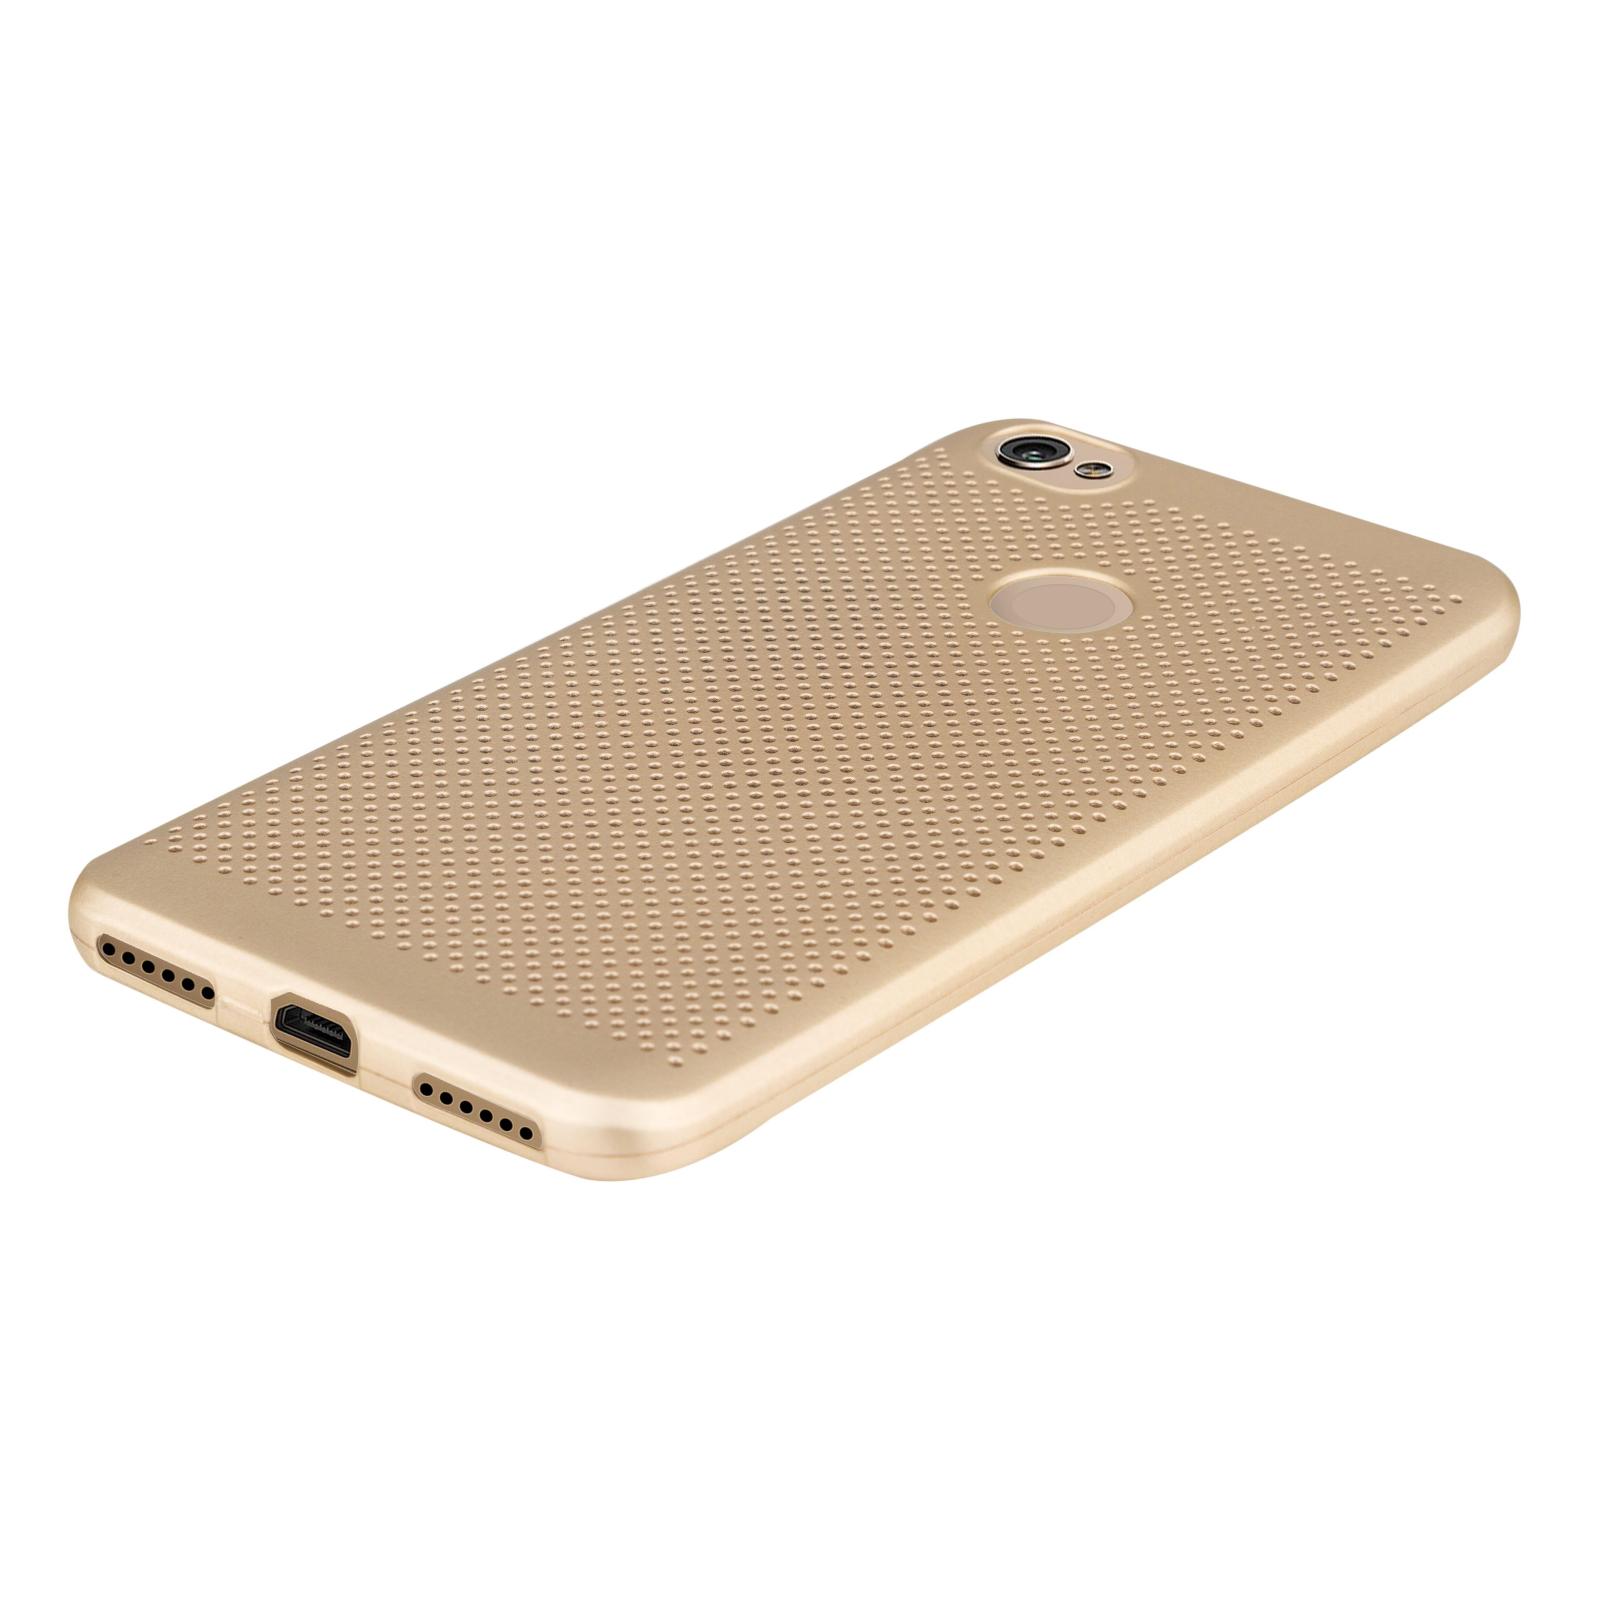 Чехол для моб. телефона MakeFuture TPU/Moon Case для Xiaomi Redmi Note 5A Prime Gold (MCM-XRN5APGD) изображение 3